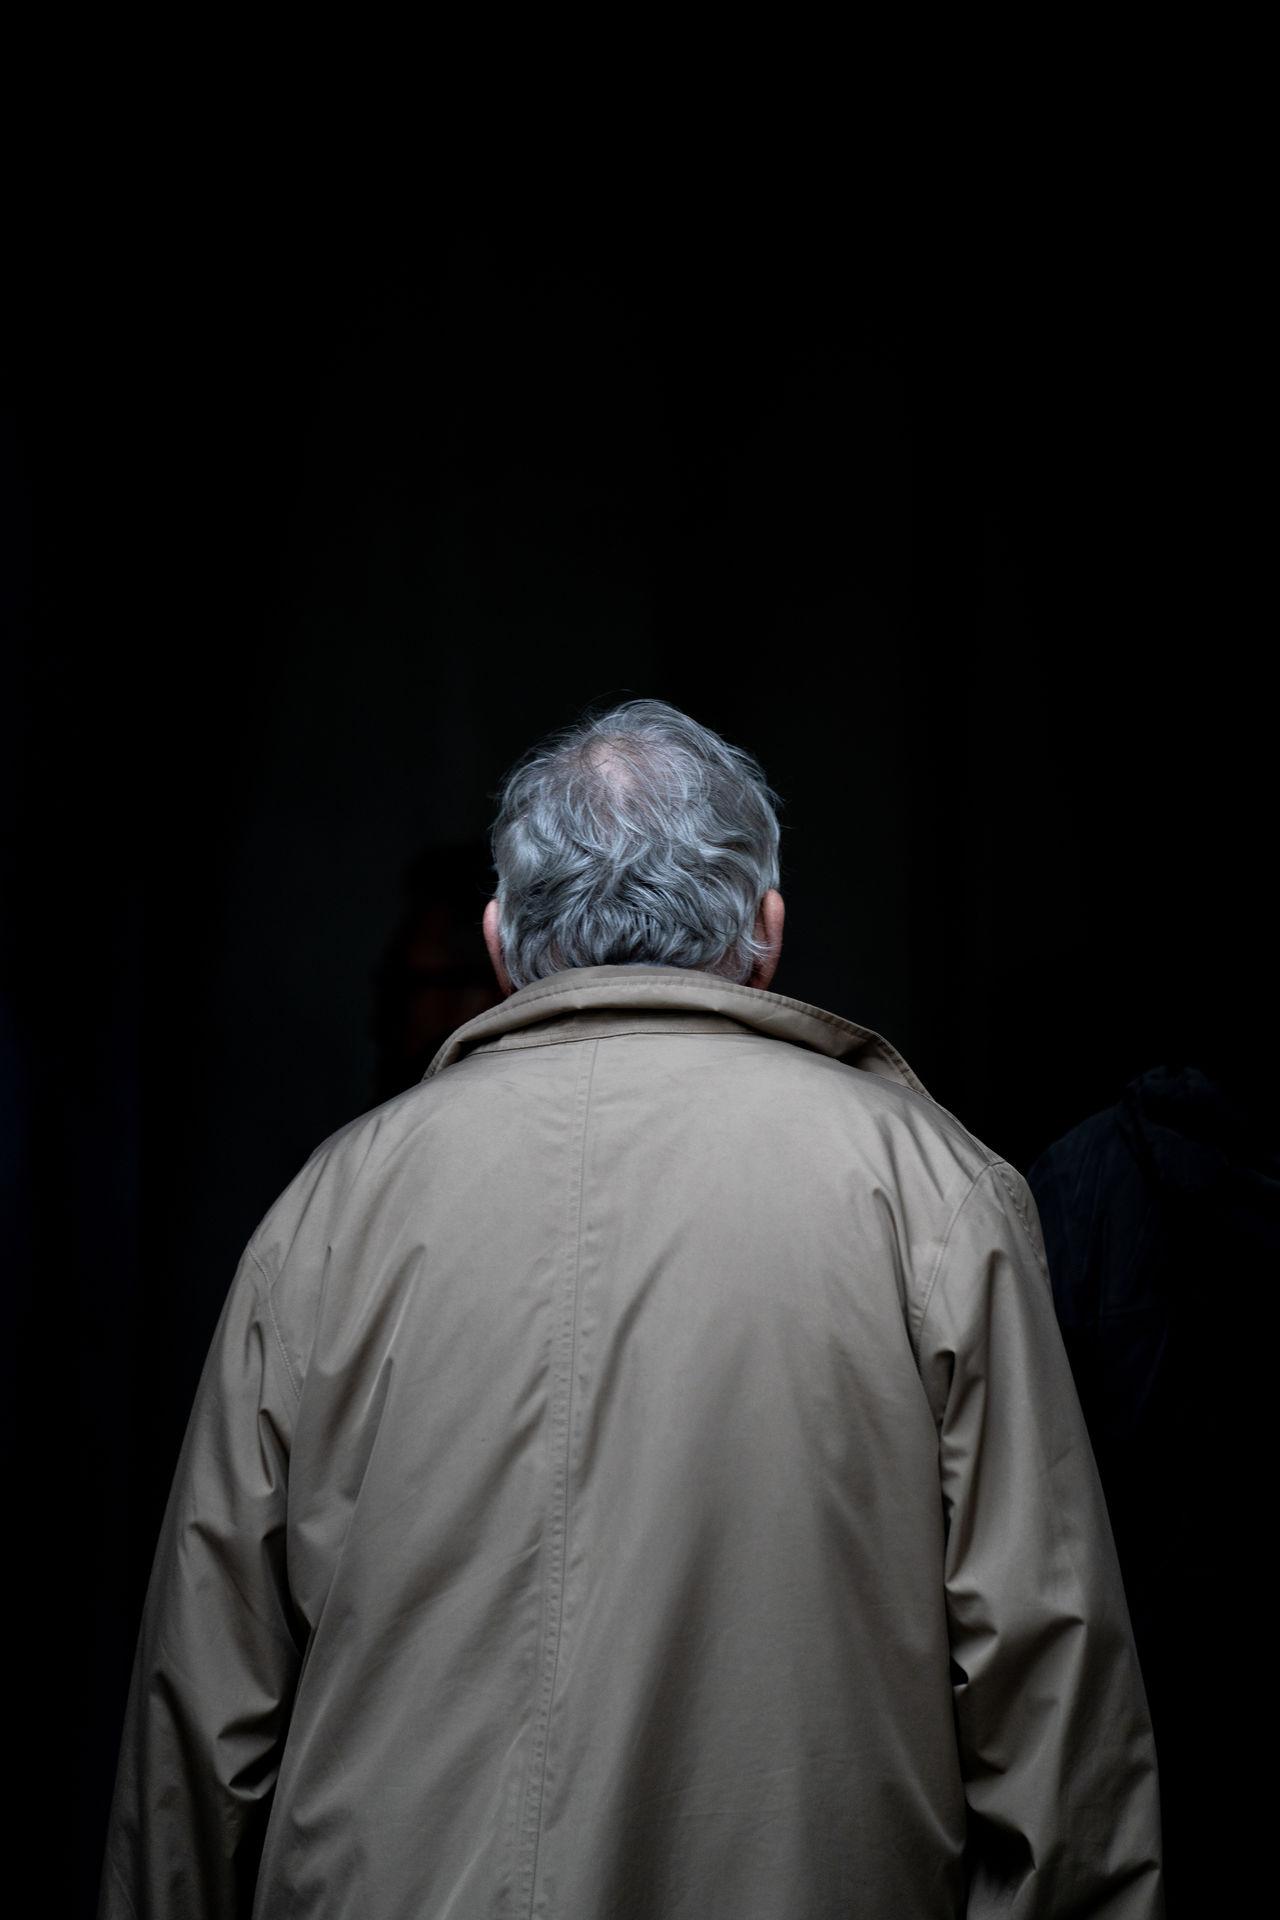 REAR VIEW OF MAN WEARING HAT AGAINST DARK BACKGROUND